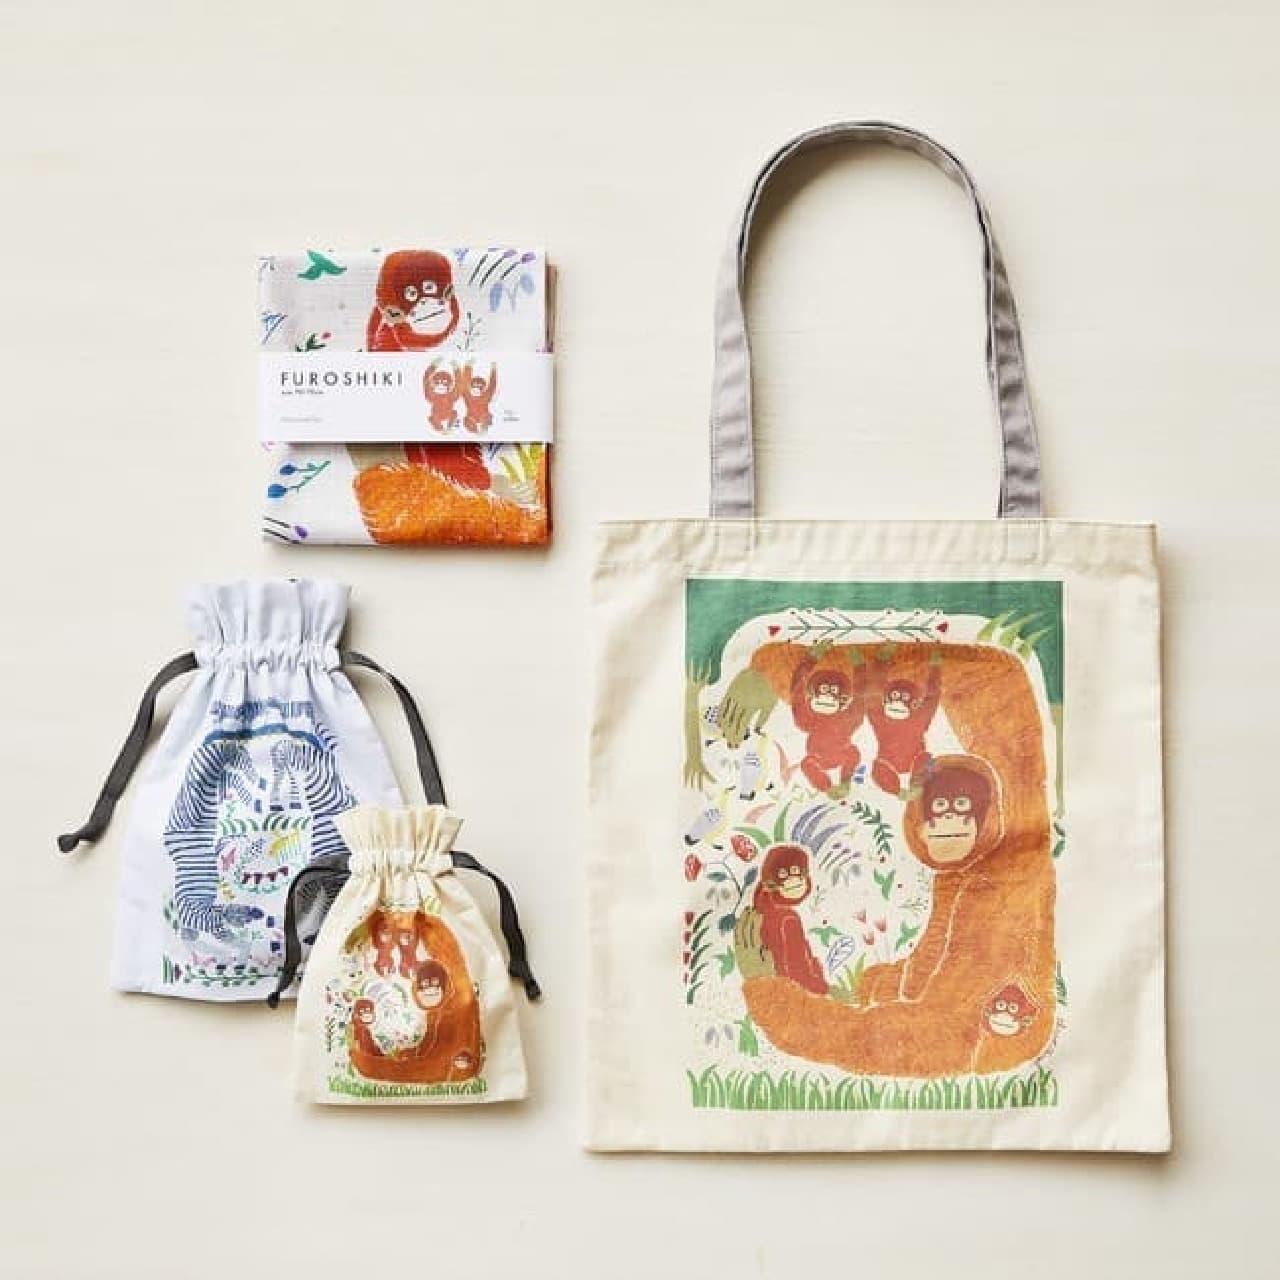 【Afternoon Tea LIVING】エコ素材の弁当箱&ショッピングバッグ -- 売上一部は「more trees」に寄付